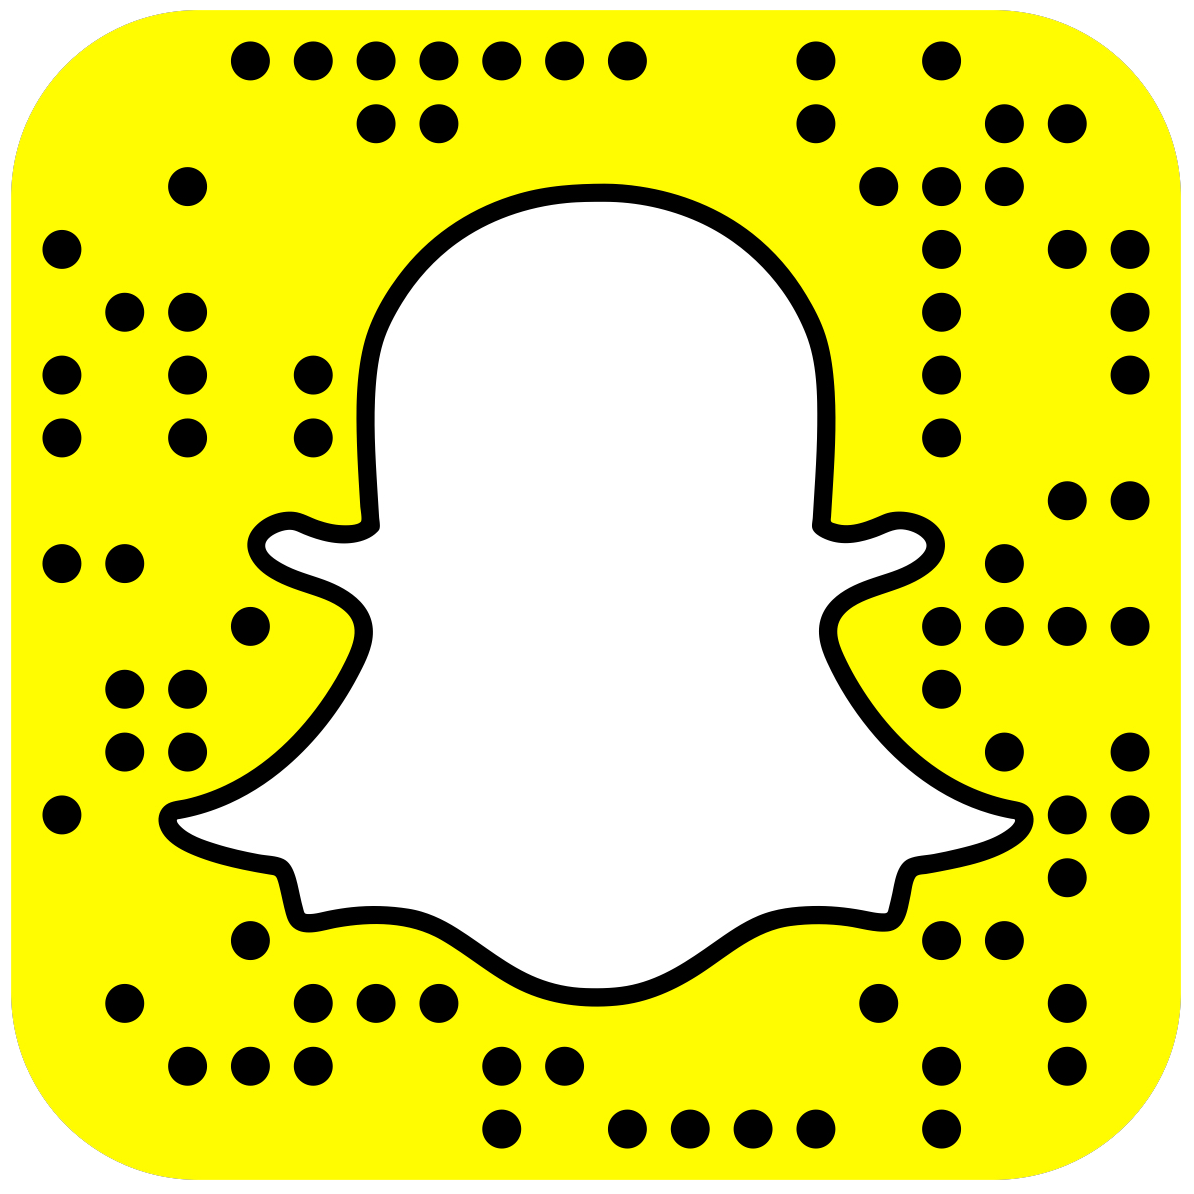 Daisy Shah Snapchat username